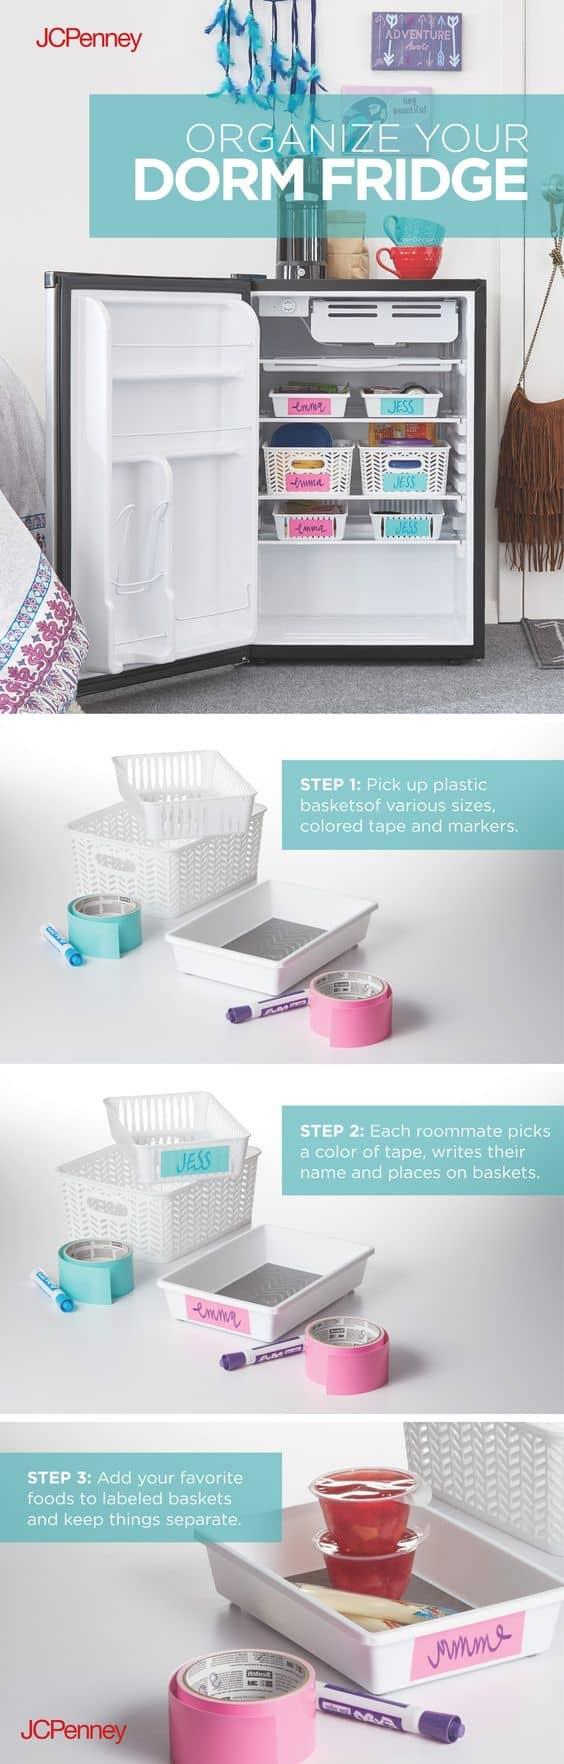 mini fridge organization ideas